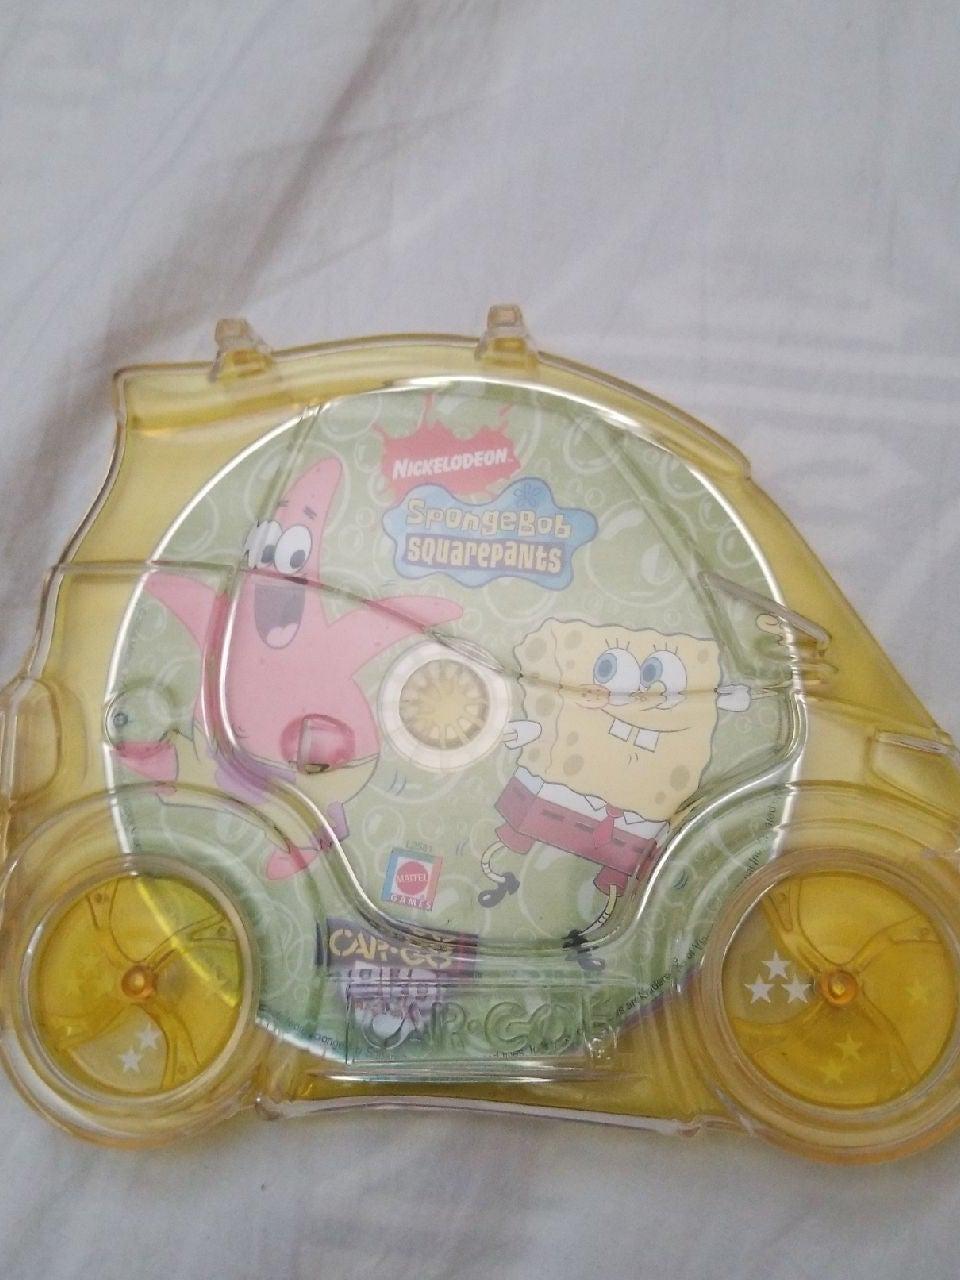 Sponge Bob Square Pants Car-Go DVD Trave